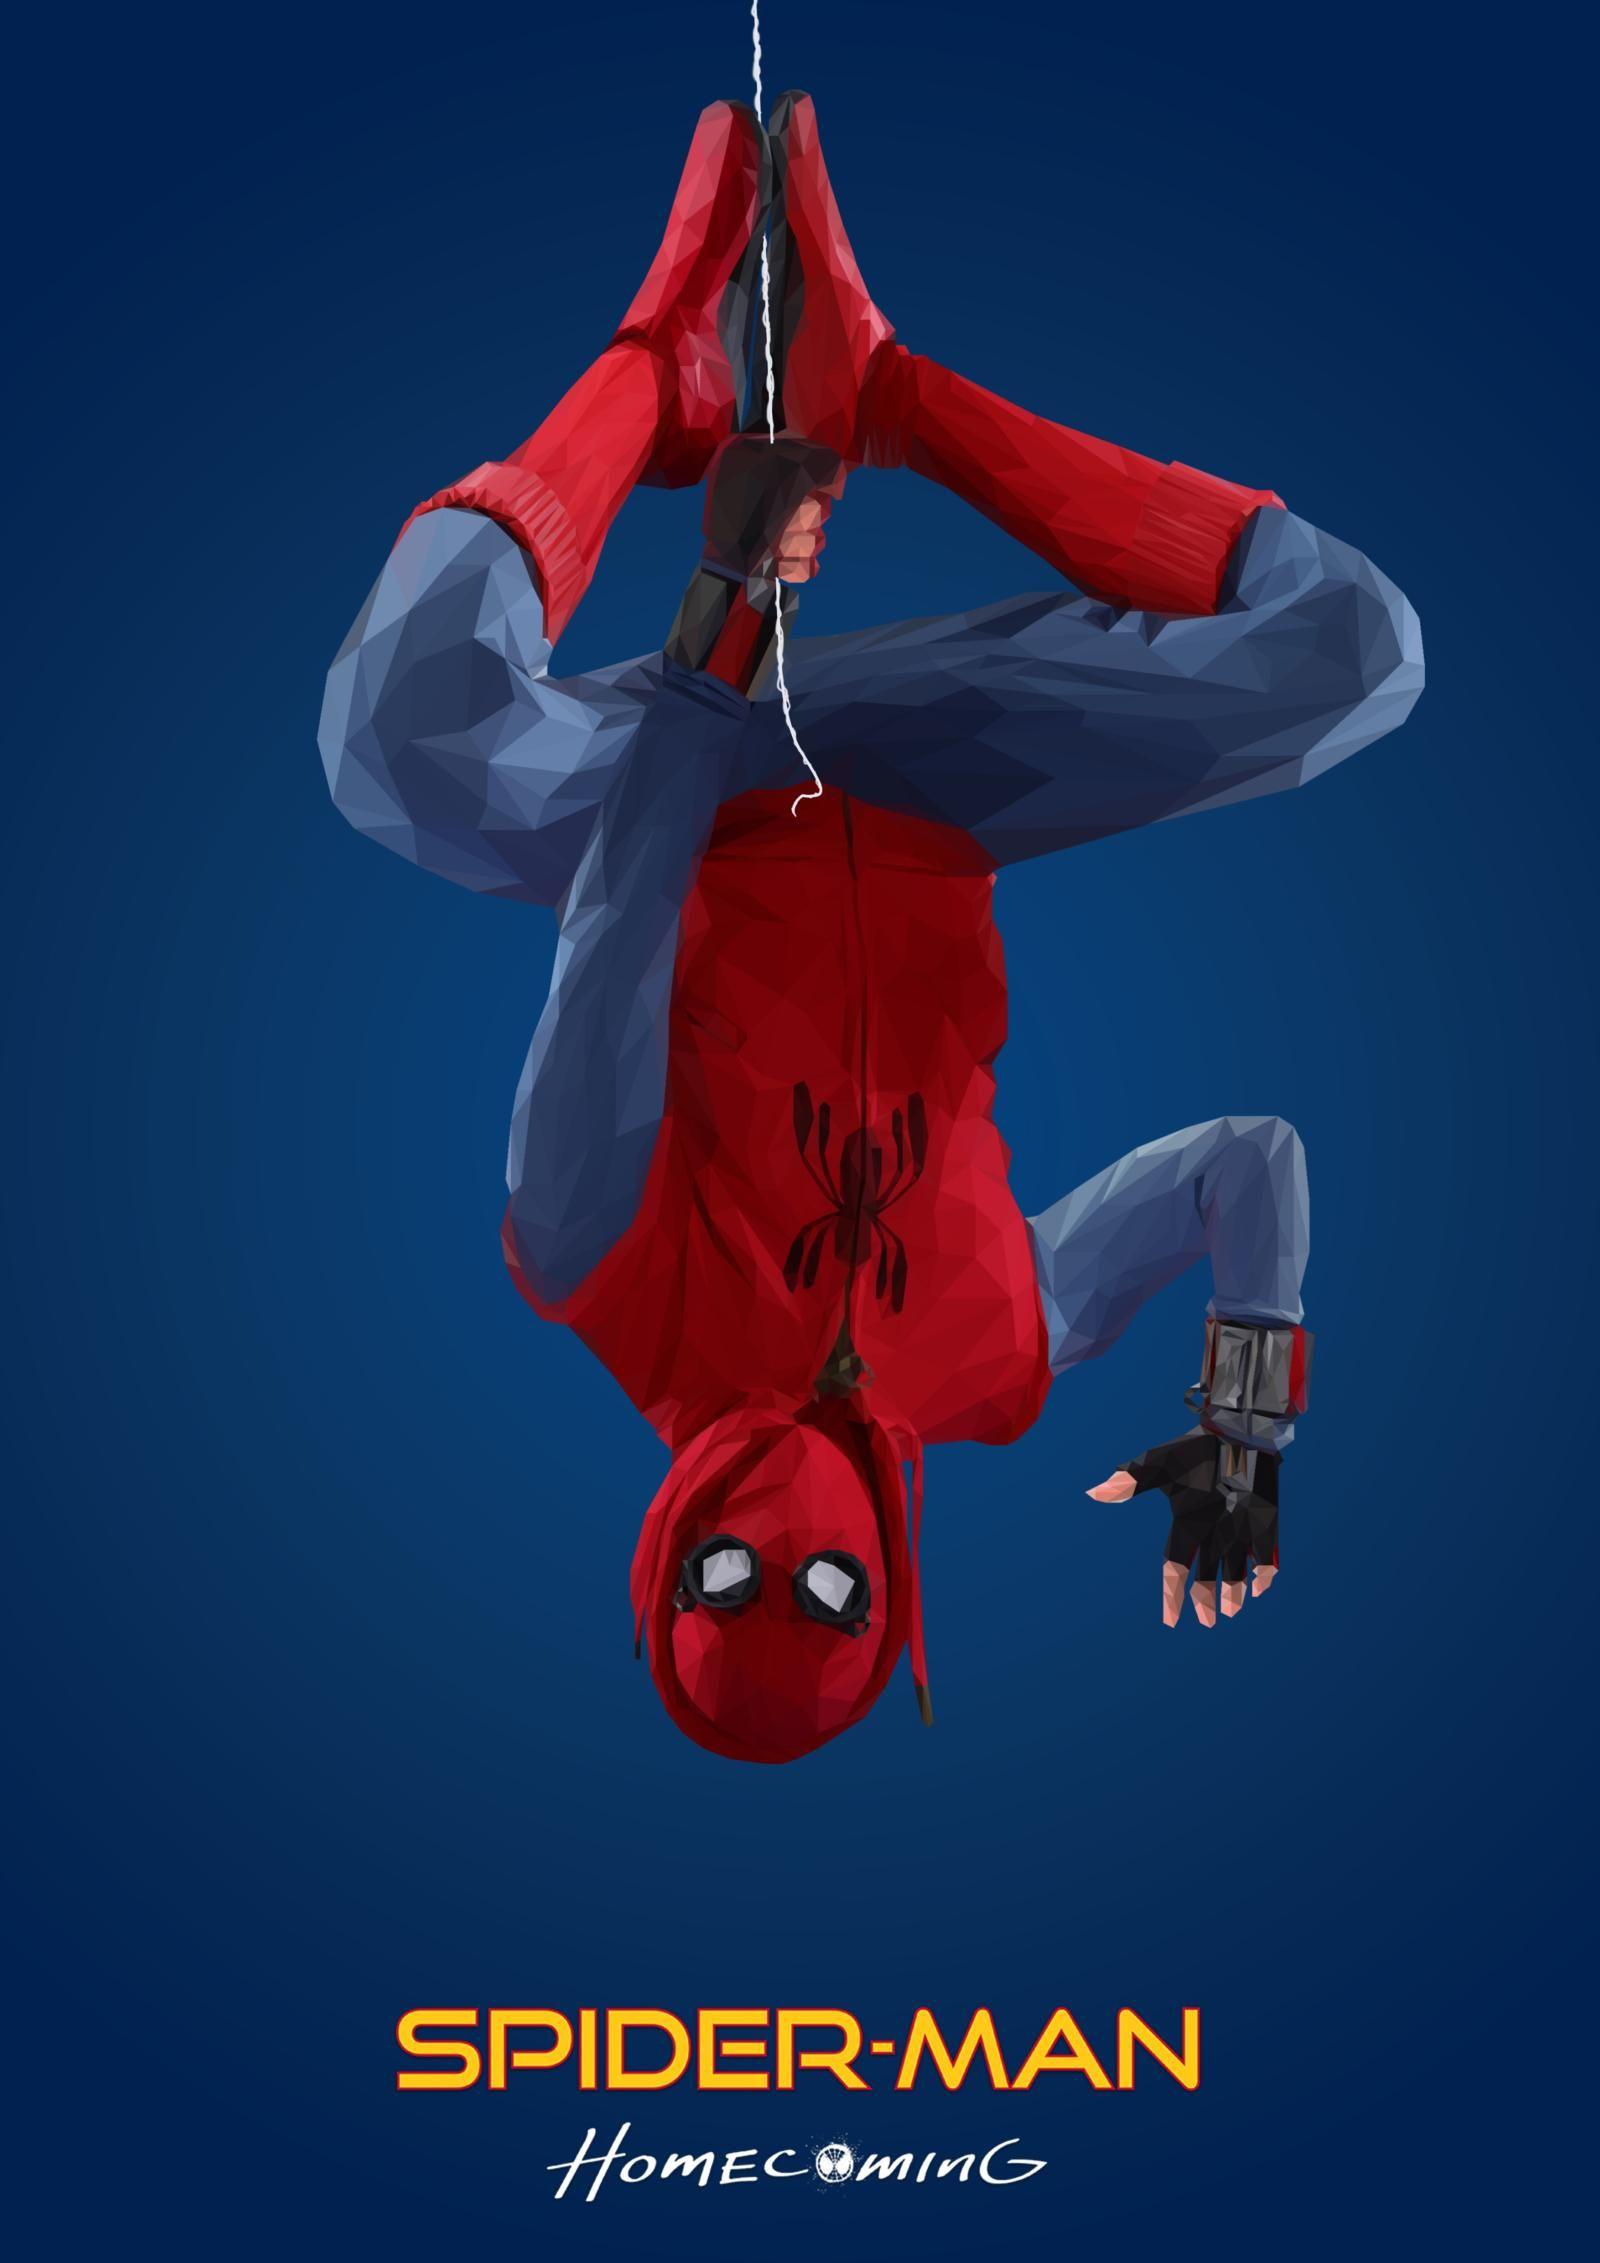 Most Inspiring Wallpaper Home Screen Spiderman - 7adcb319188d5c5ede58b346f006a8cf  Trends_711320.jpg